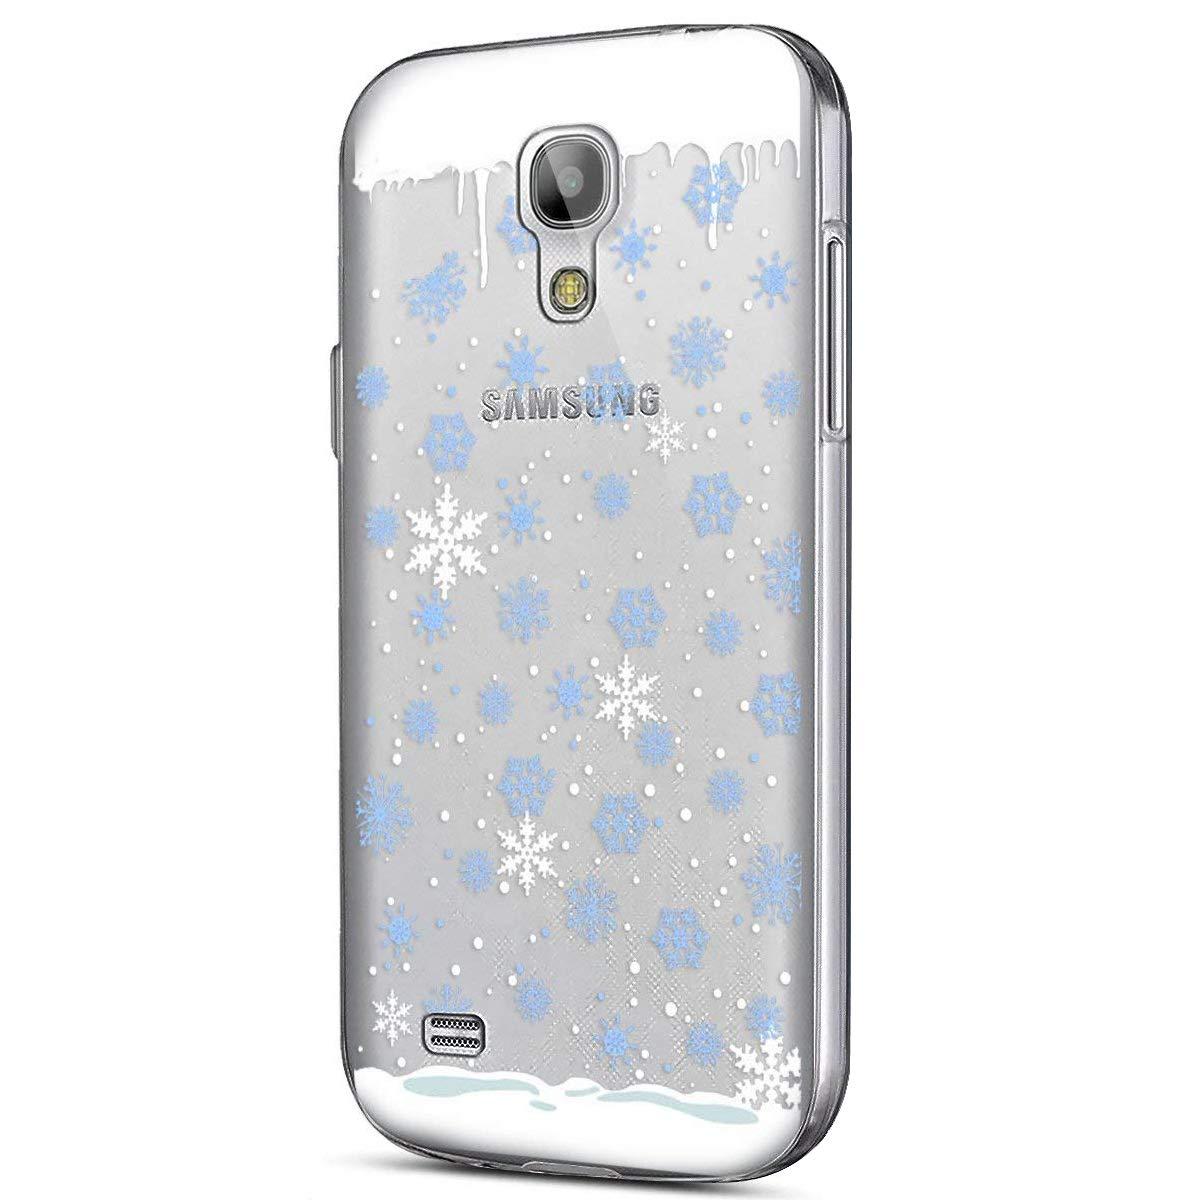 Clair Coque Samsung Galaxy S4, Coque Galaxy S4 Transparente, Samsung S4 Etui en Silicone Extra Slim Lé ger Gel TPU Souple Etui Cré atif Noë l Christmas Flocon de Neige é lan Motif Case Okssud DYY2018002188#03